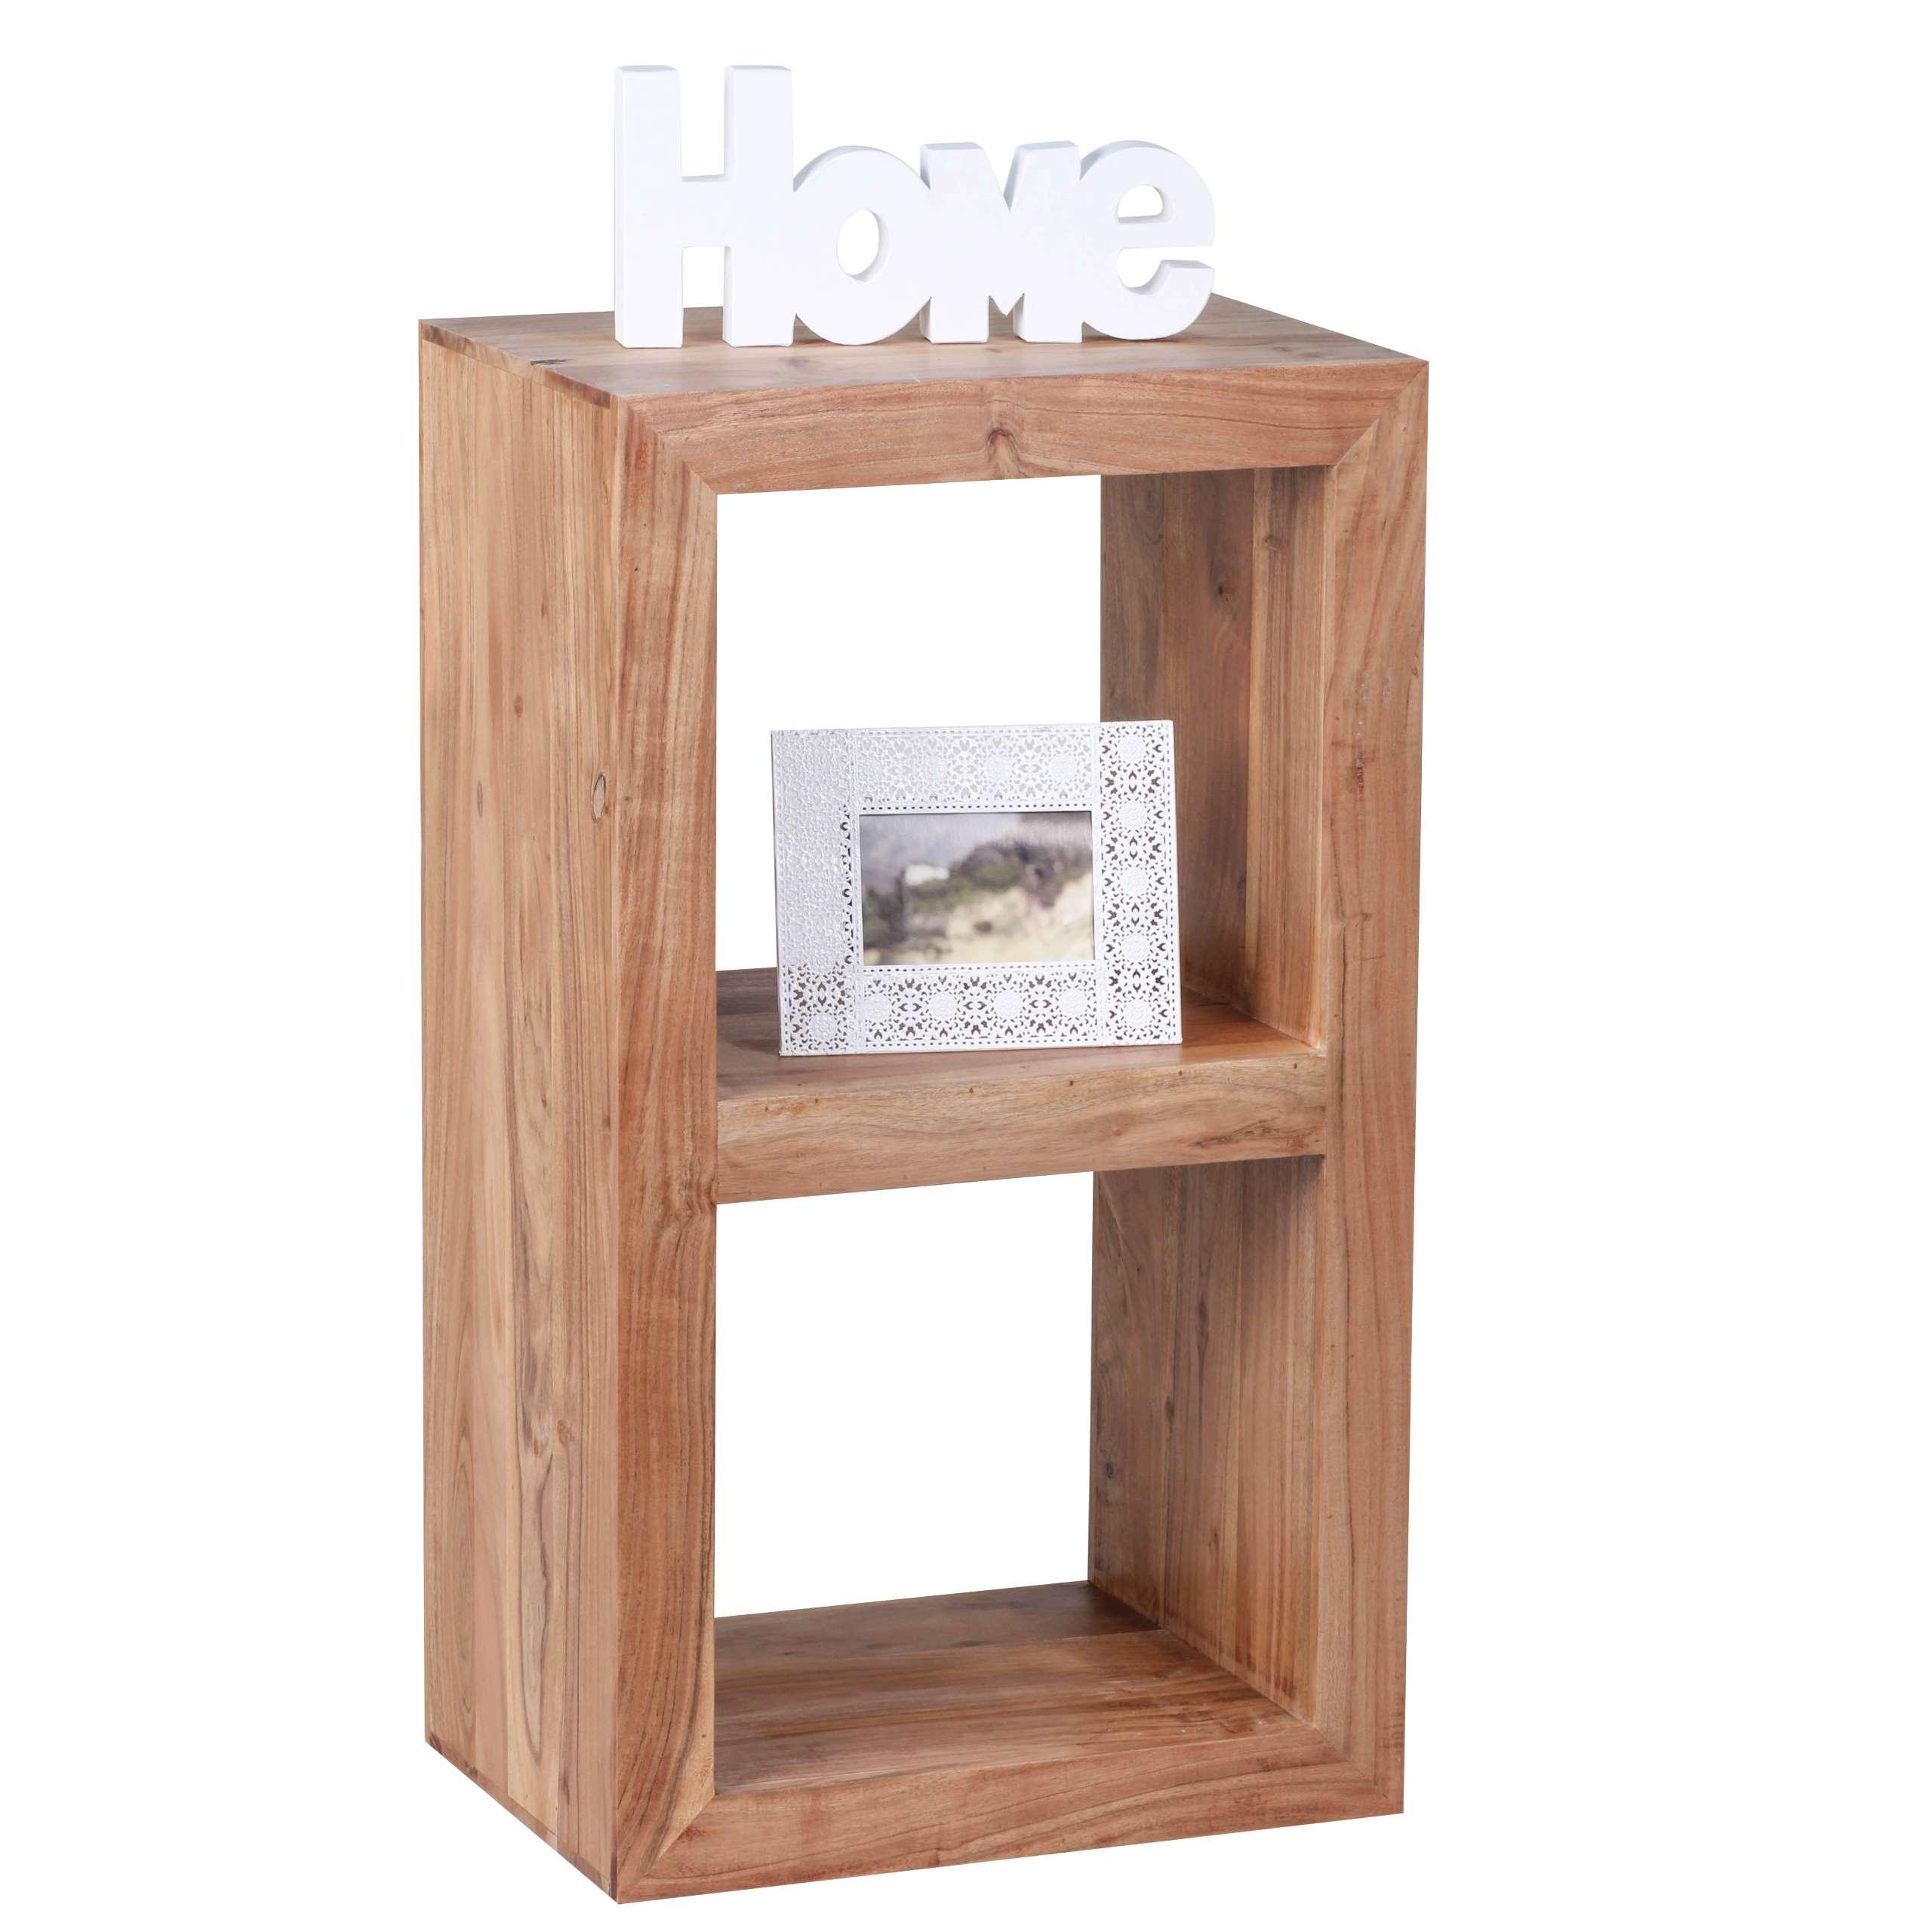 standregal konya regal beistelltisch akazie massivholz 88x50x35cm. Black Bedroom Furniture Sets. Home Design Ideas